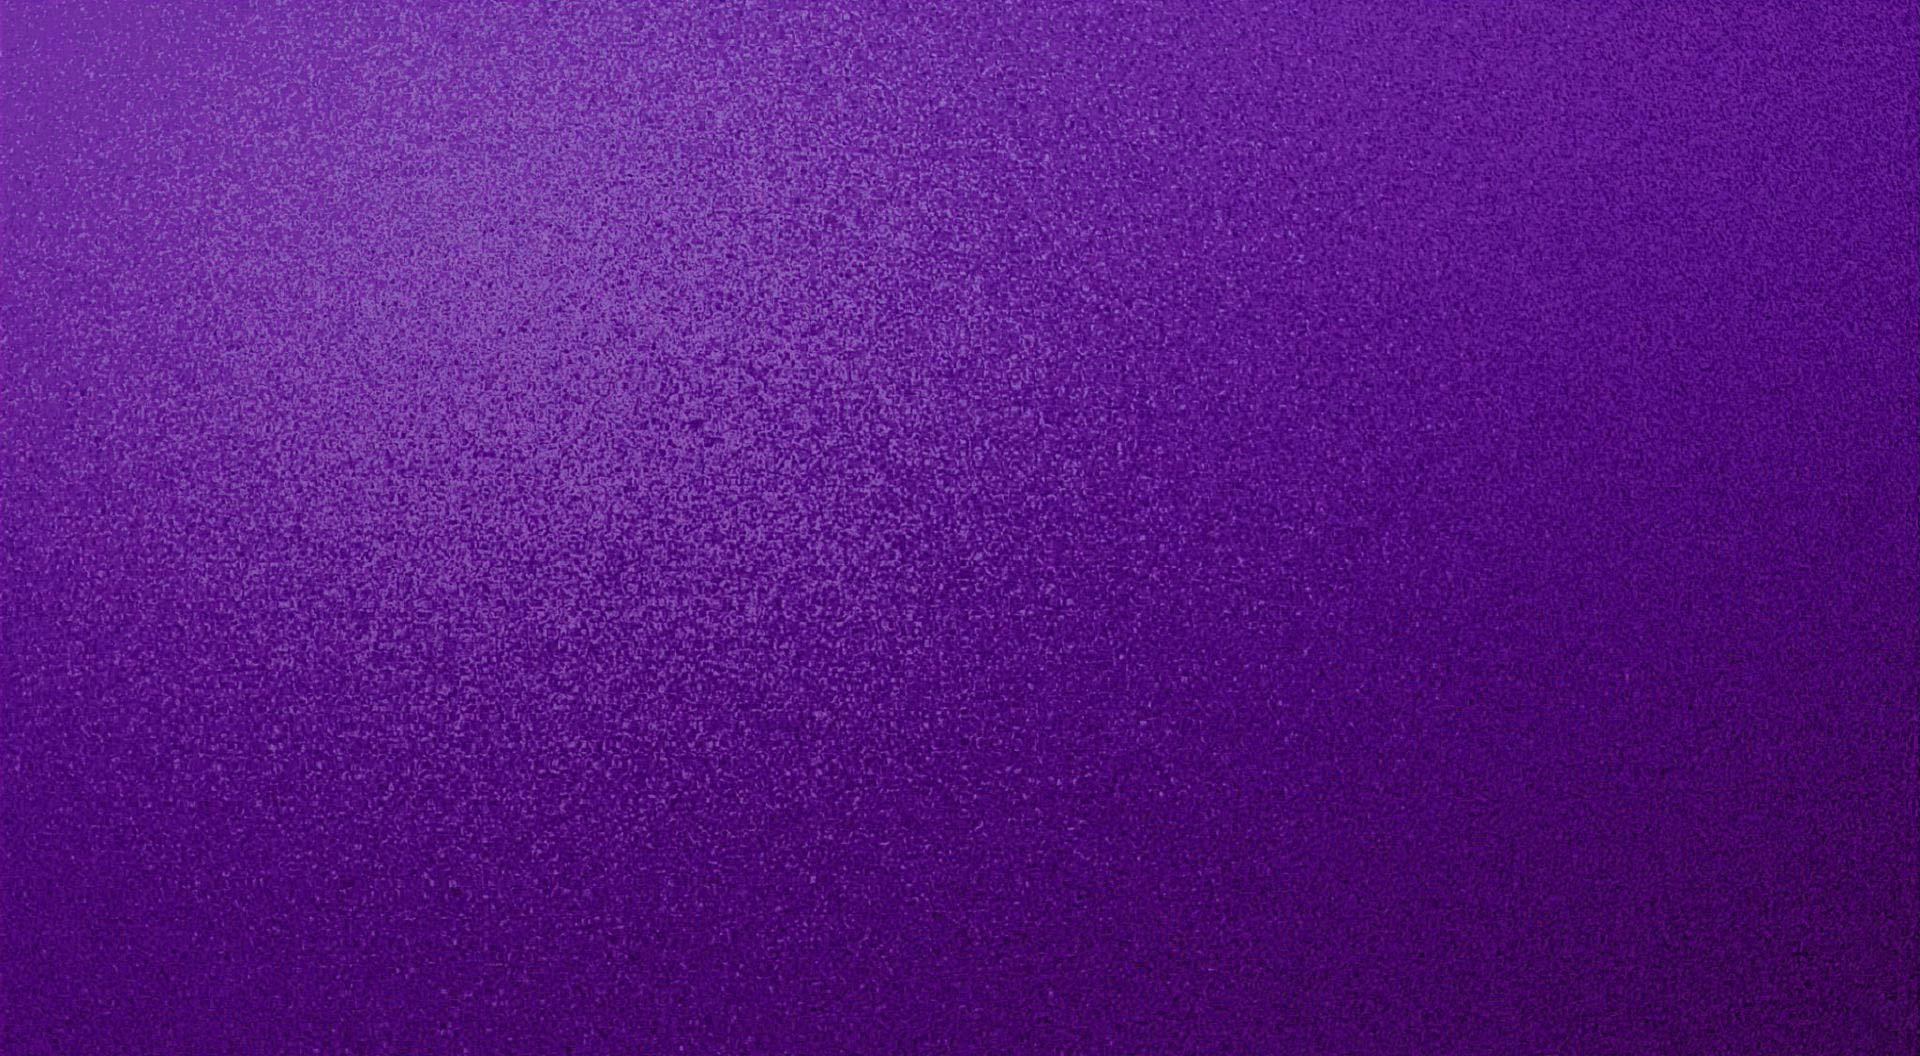 Purple Backgrounds HD 1920x1056